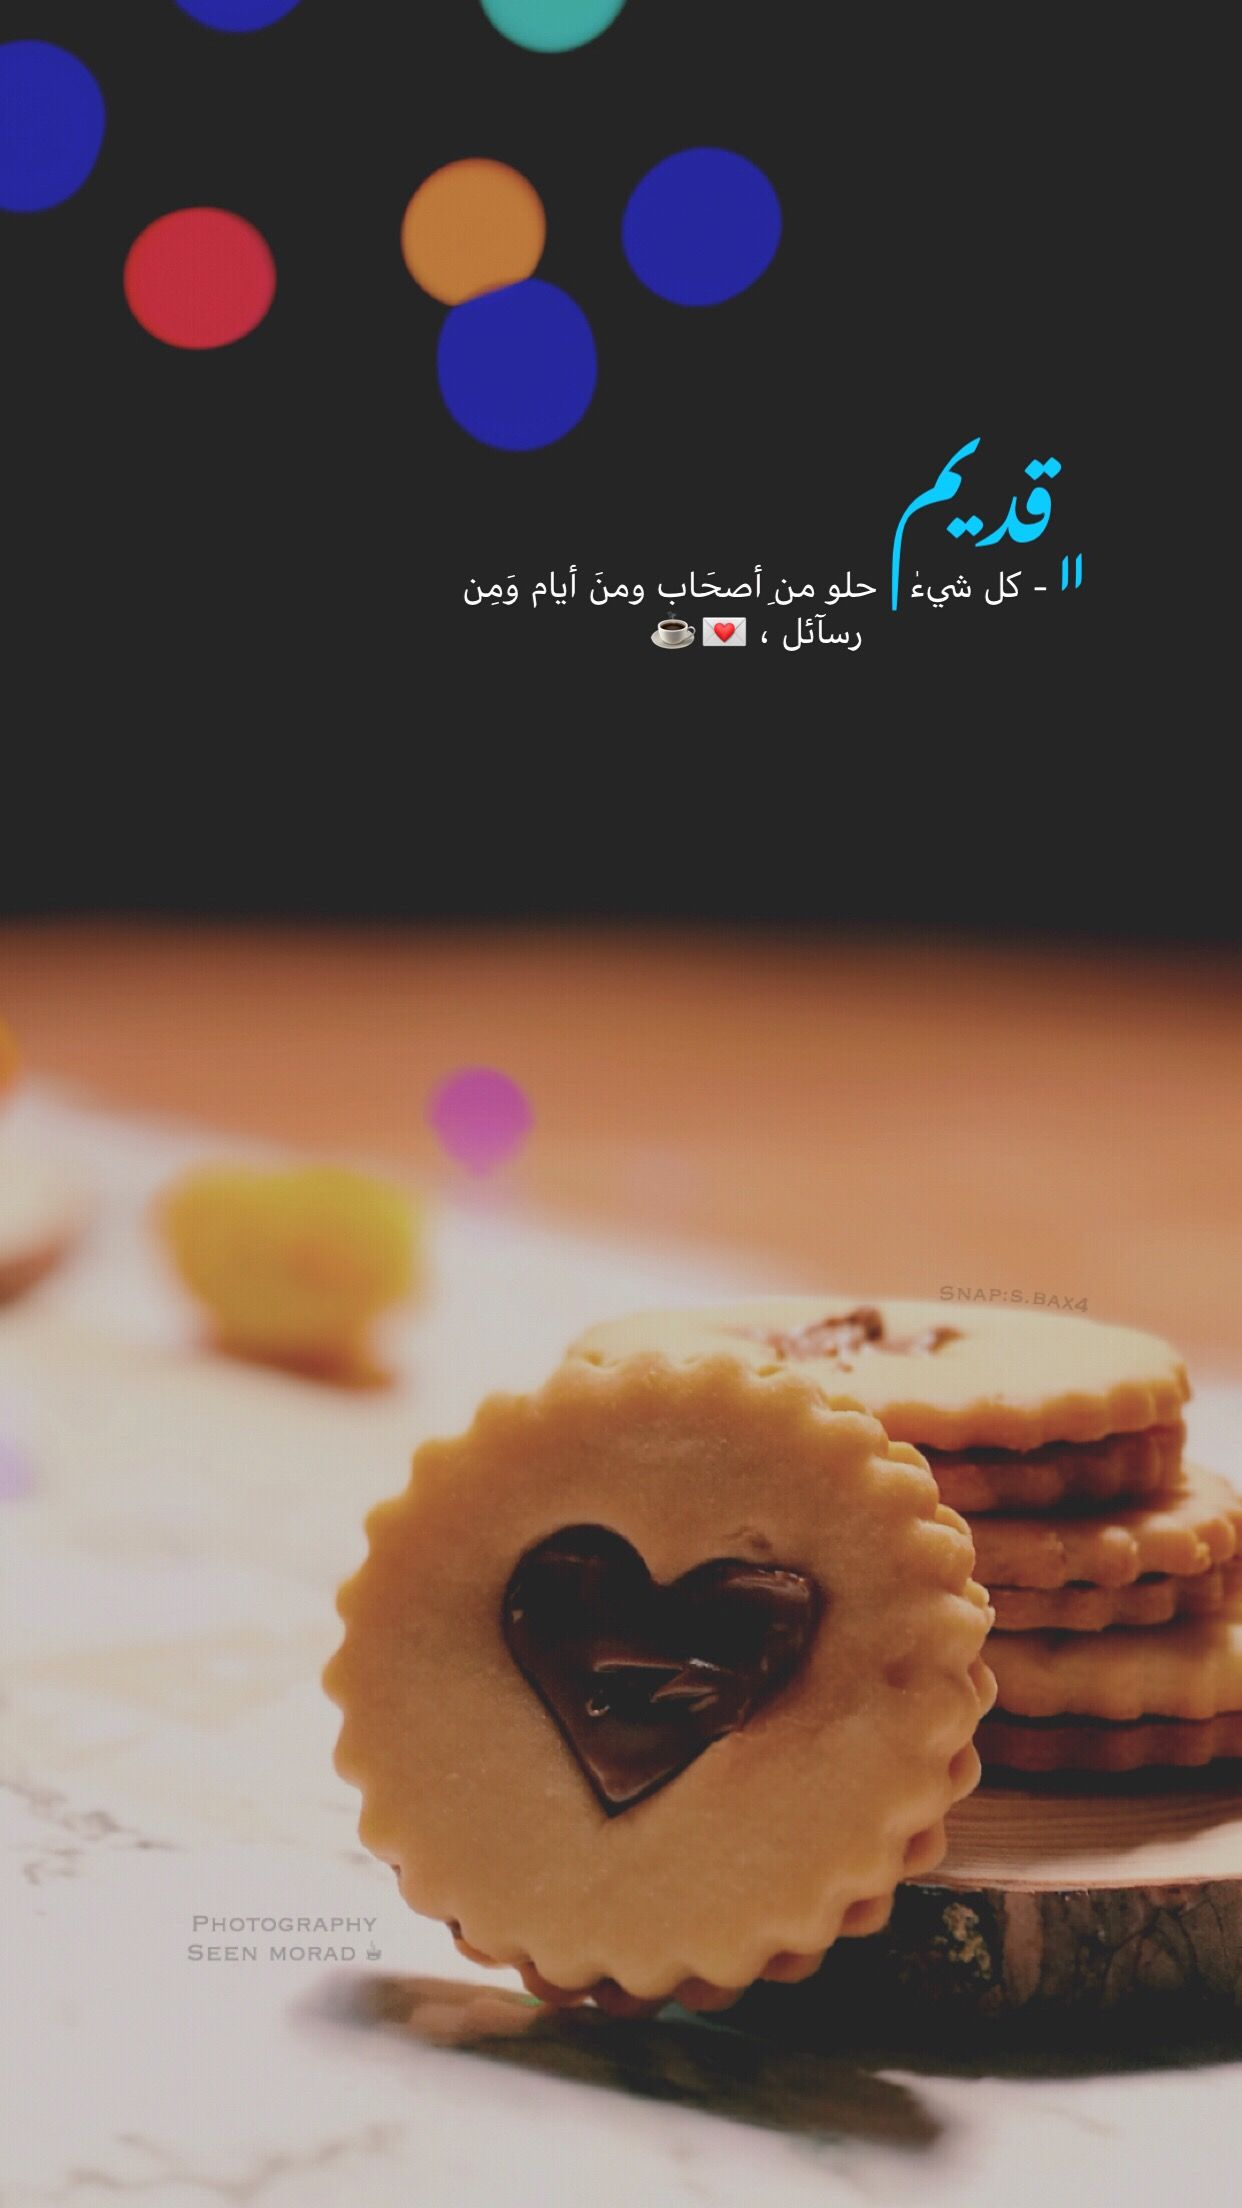 صور دعاء يوميات سكرابز رمزيات قلب صور عرض صور جميلات تصويري الوان Polaroid Pictures Art Drawings Arabic Words